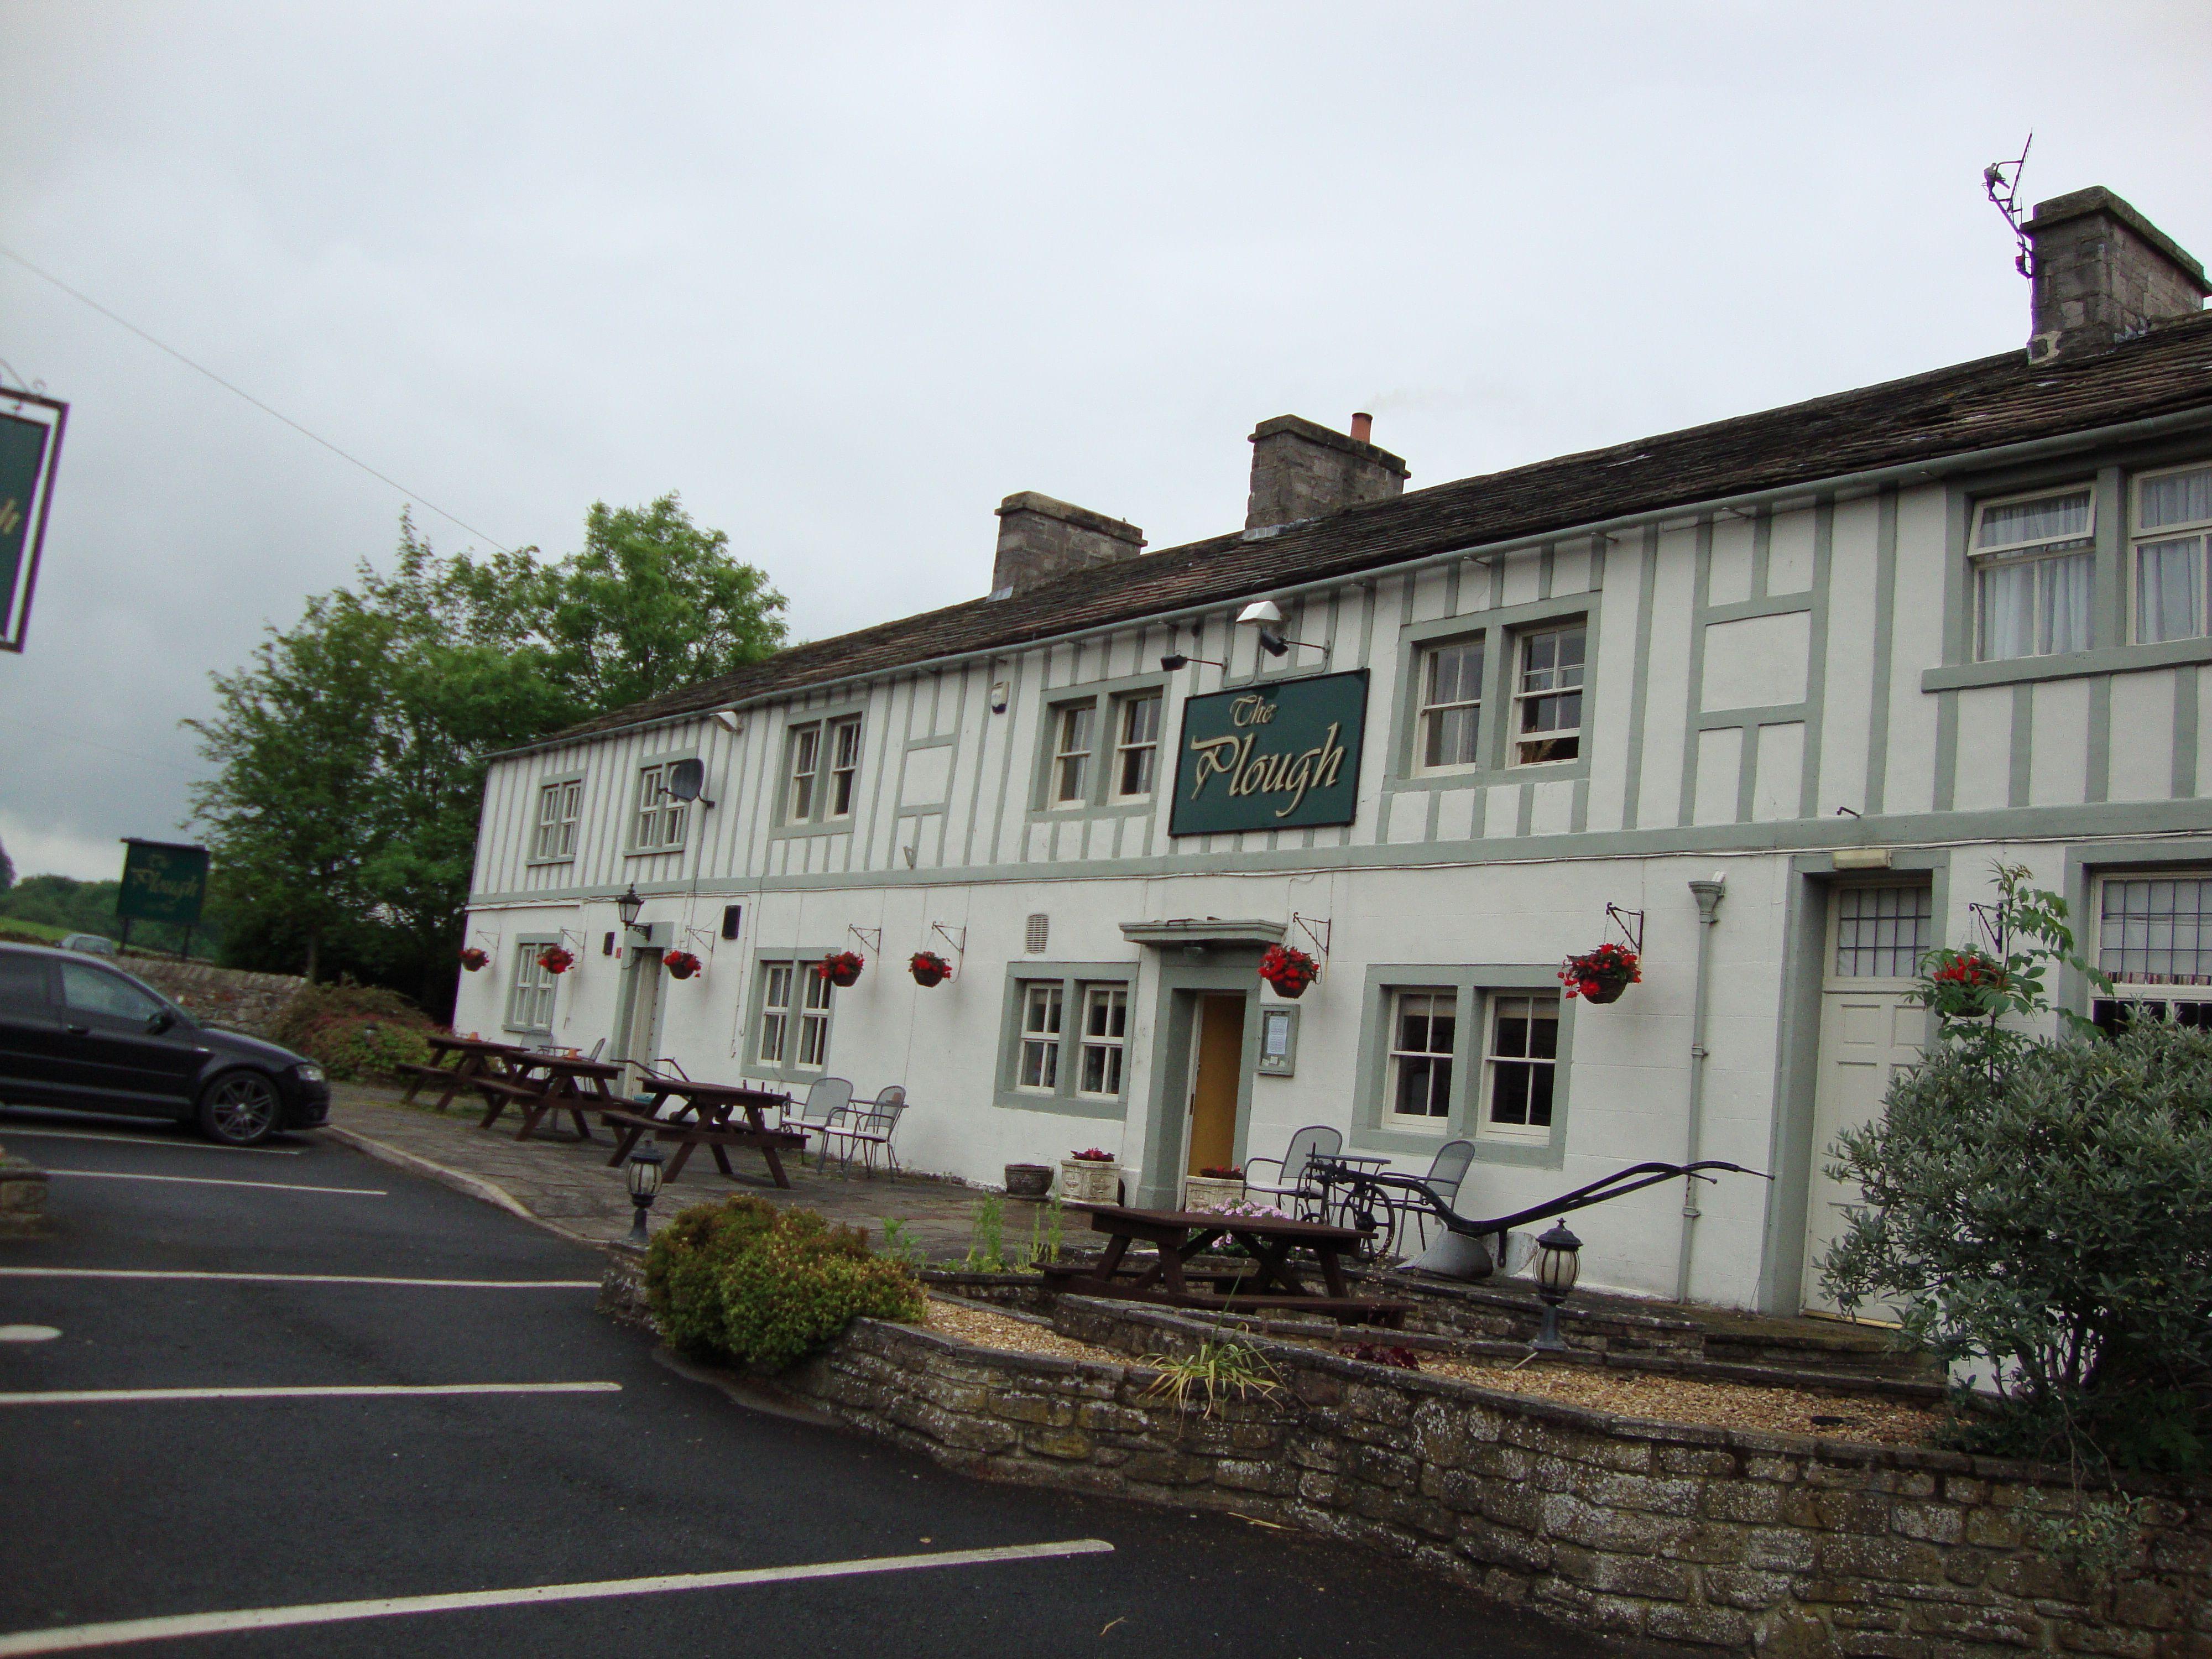 The Plough Inn Inn, The plough, Structures